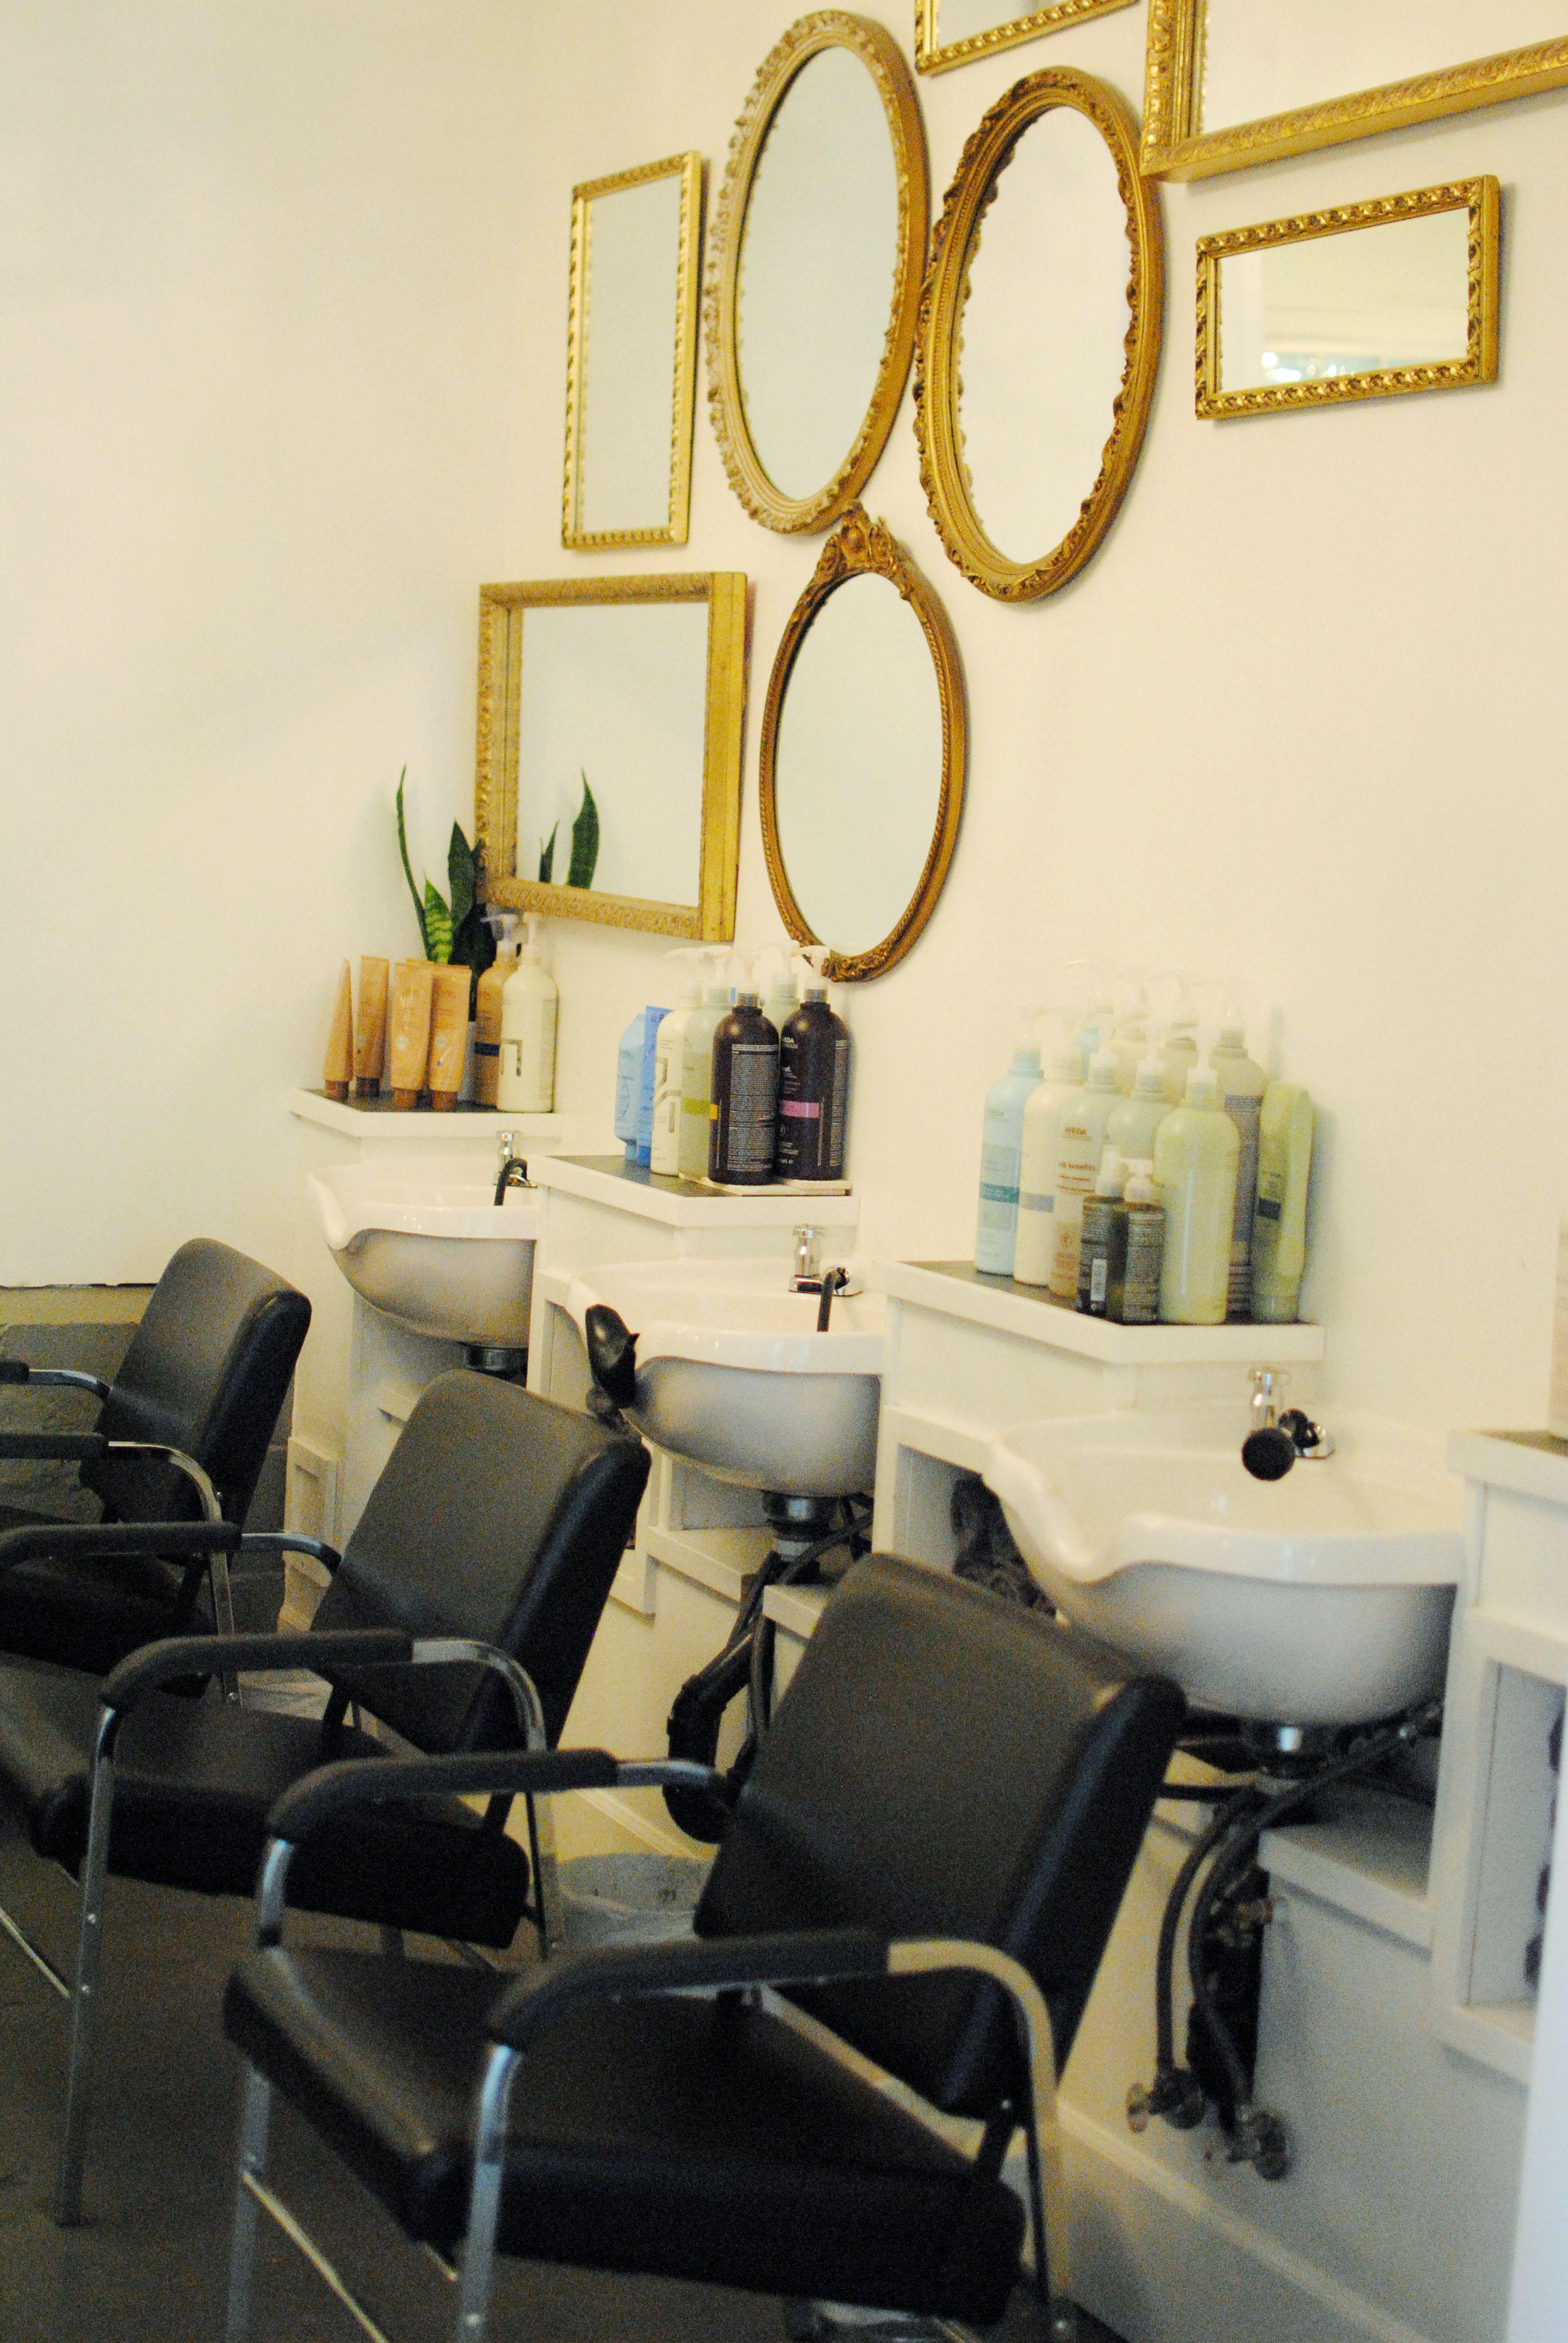 trim hair salon interiordecor chaise. Black Bedroom Furniture Sets. Home Design Ideas